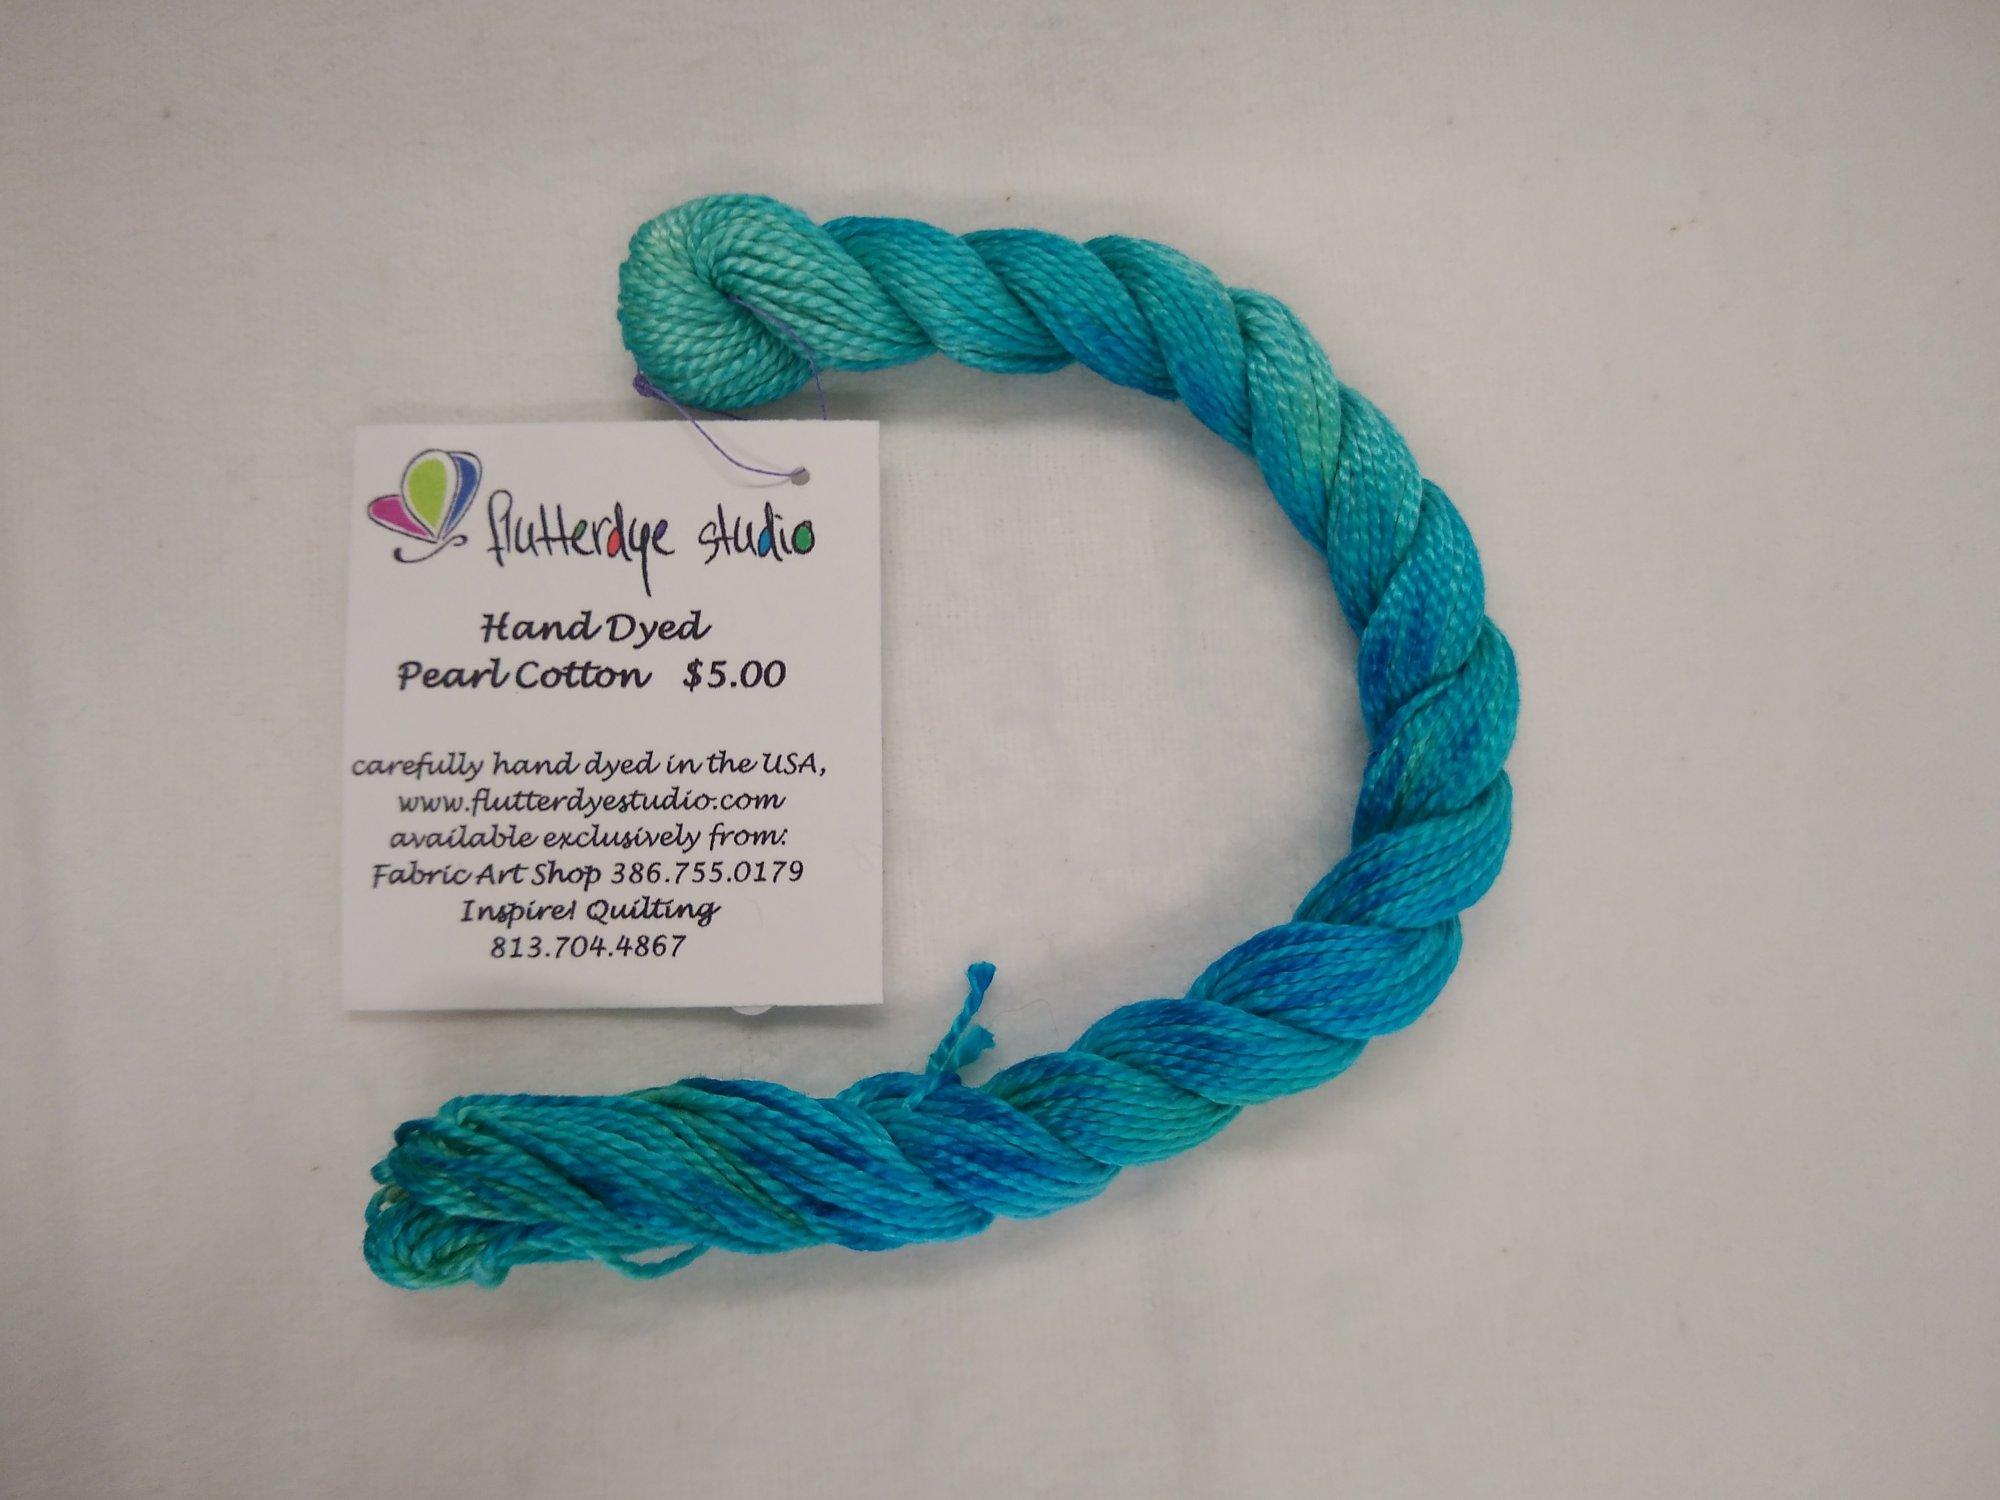 Flutterdye Studio - Hand Dyed Pearl Cotton - 12wt - Varigated - 15 yds/ 13.7 m